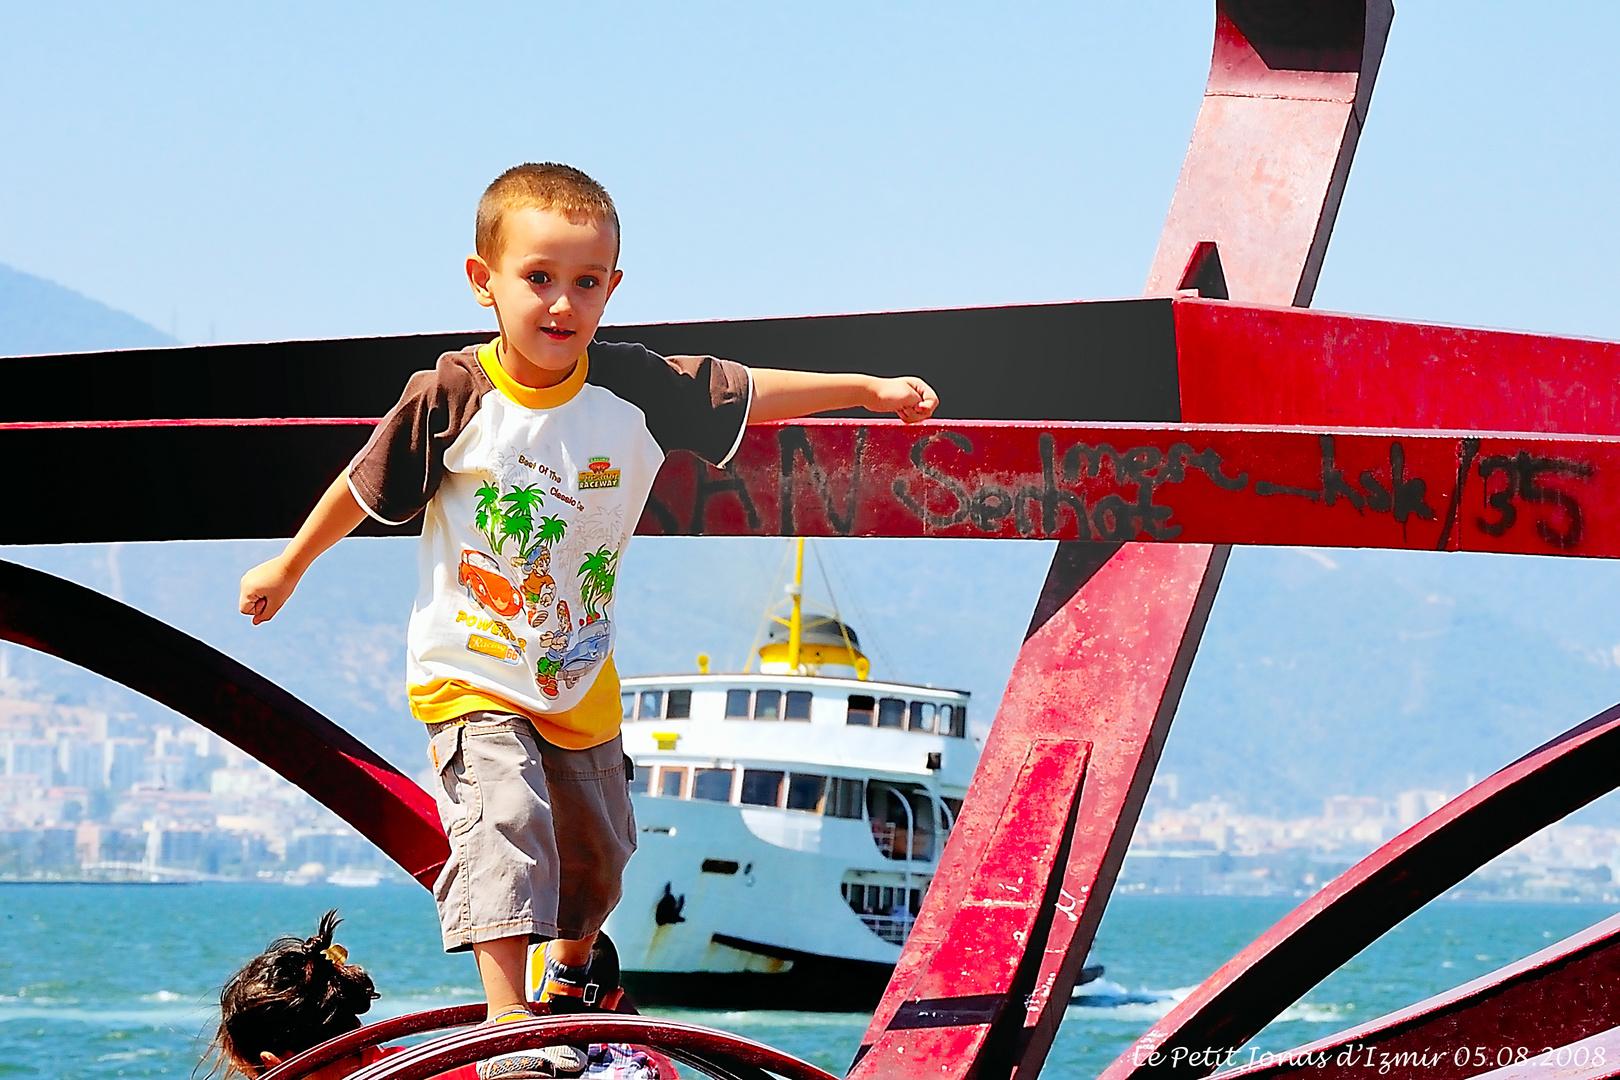 Le Petit Jonas d'Izmir (05.08.2008)